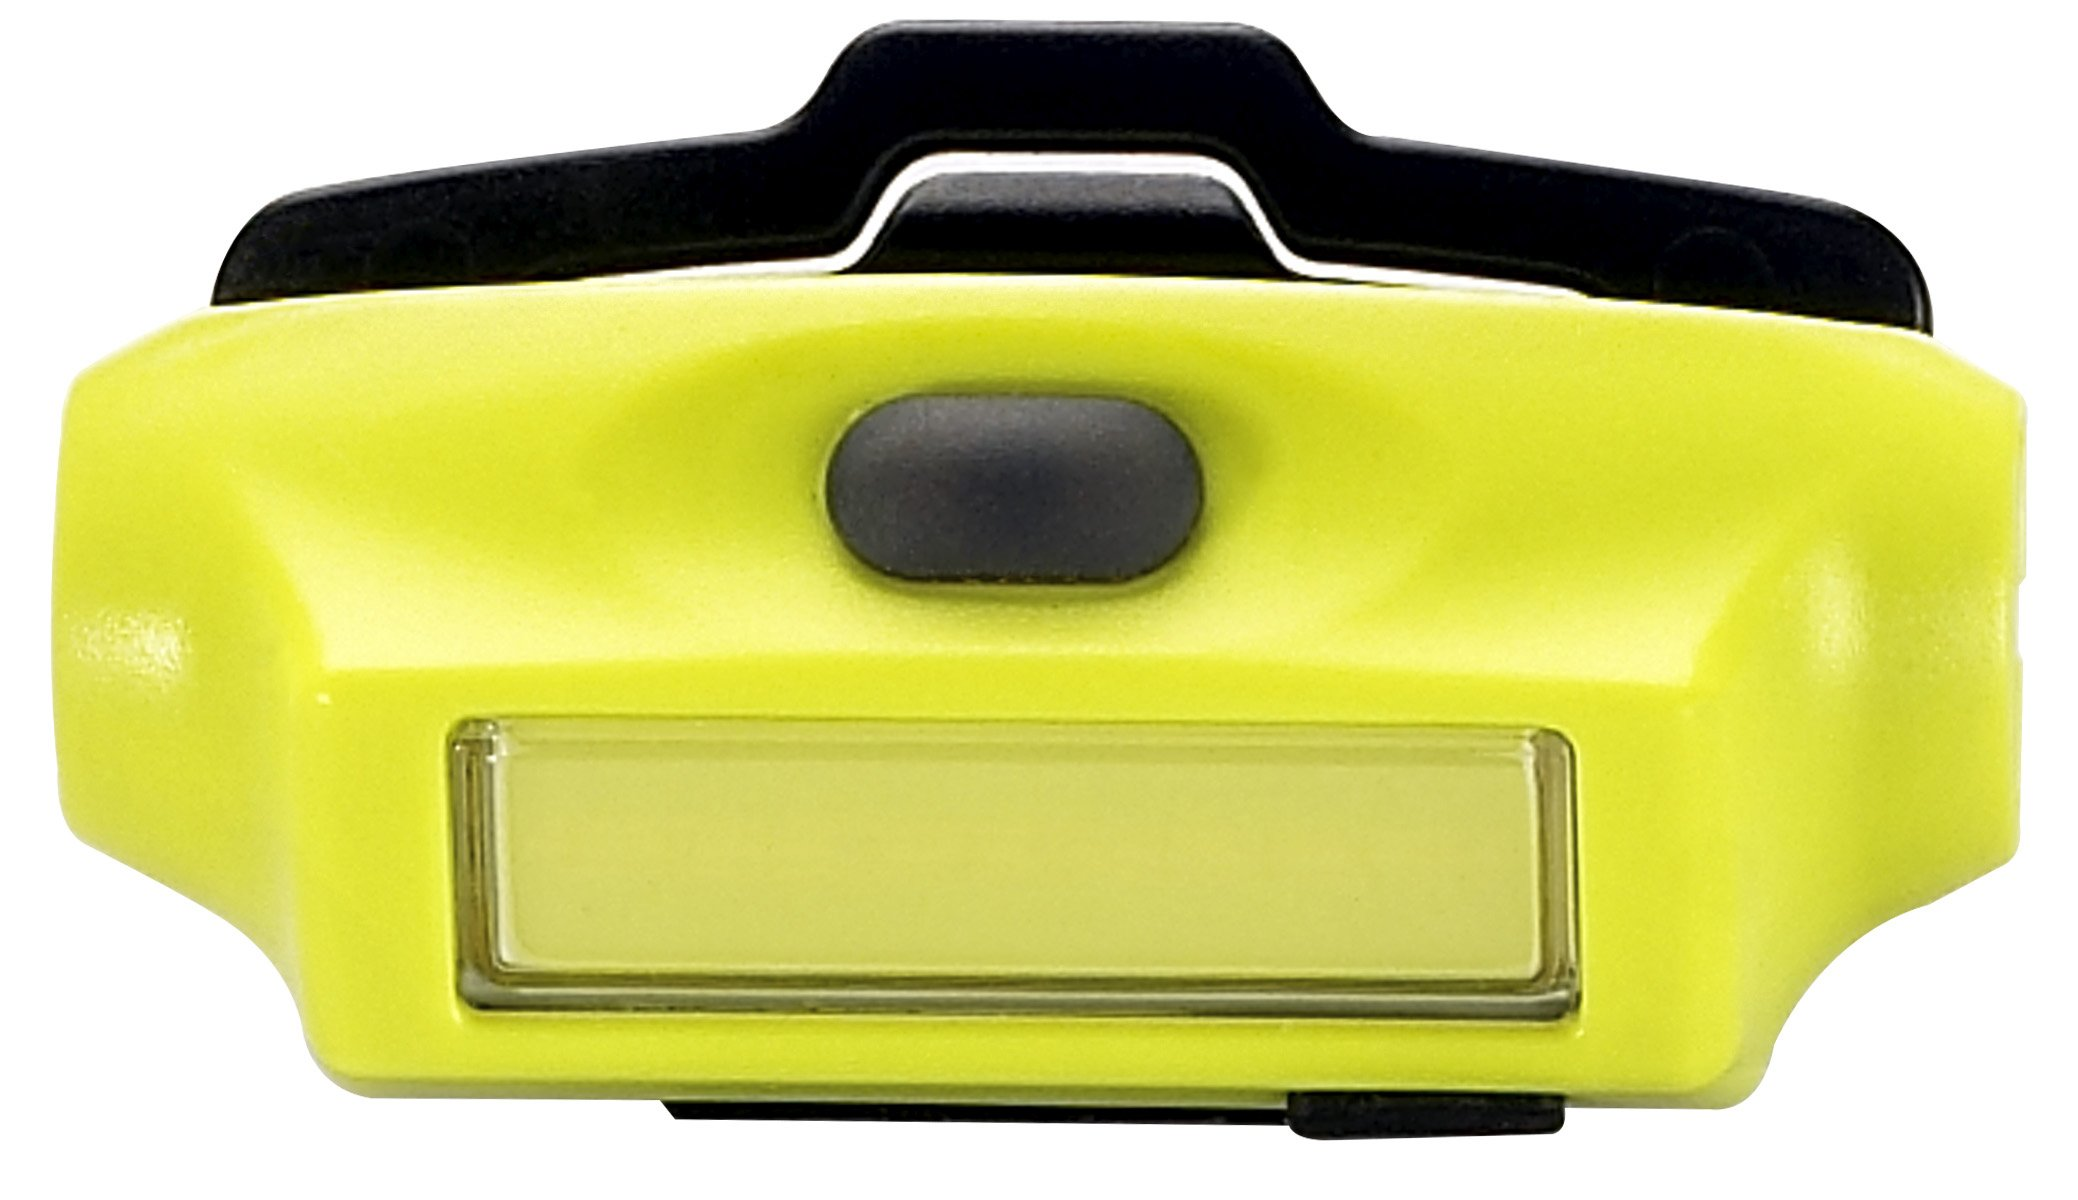 Streamlight Bandit LED Rechargeable Headlamp